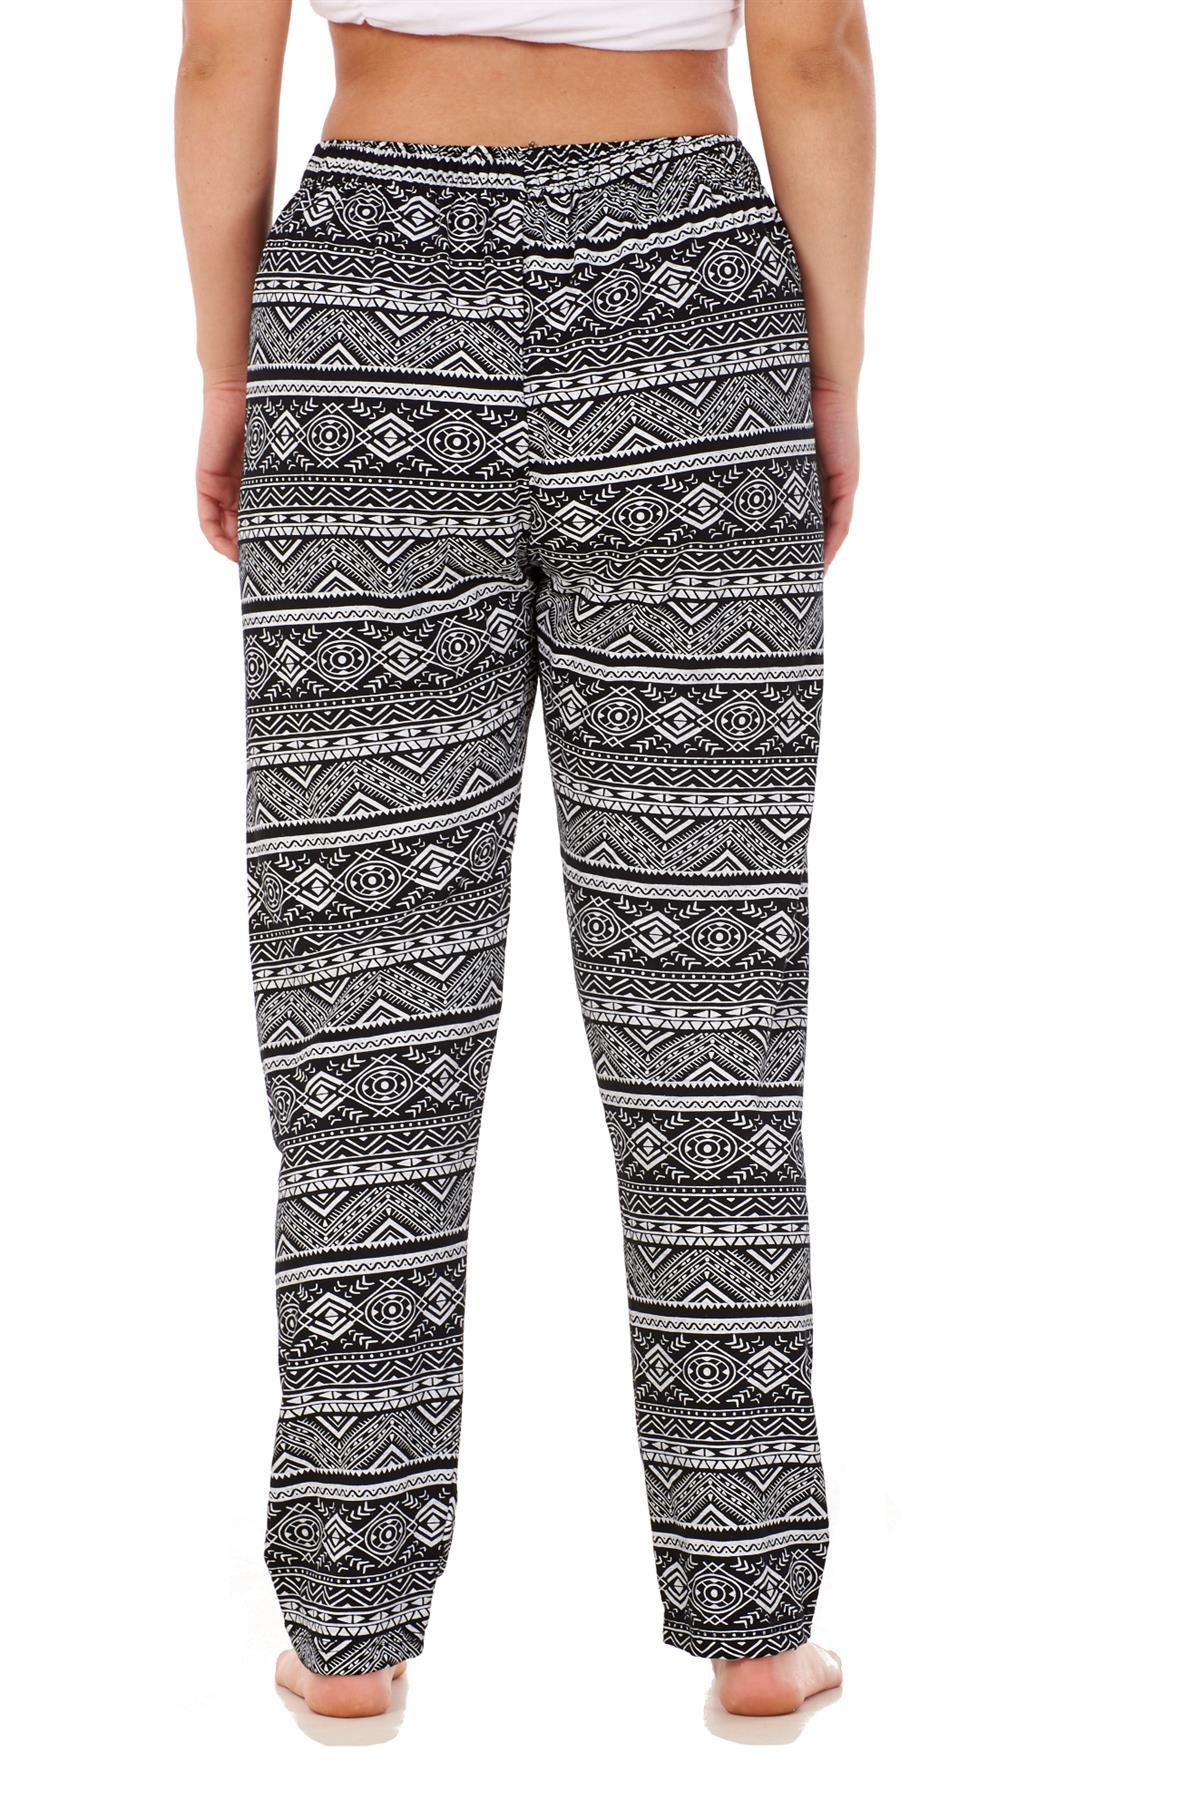 Ladies-Women-Trouser-Elasticated-Printed-Tapered-Harem-High-waist-Regular-Pants thumbnail 16